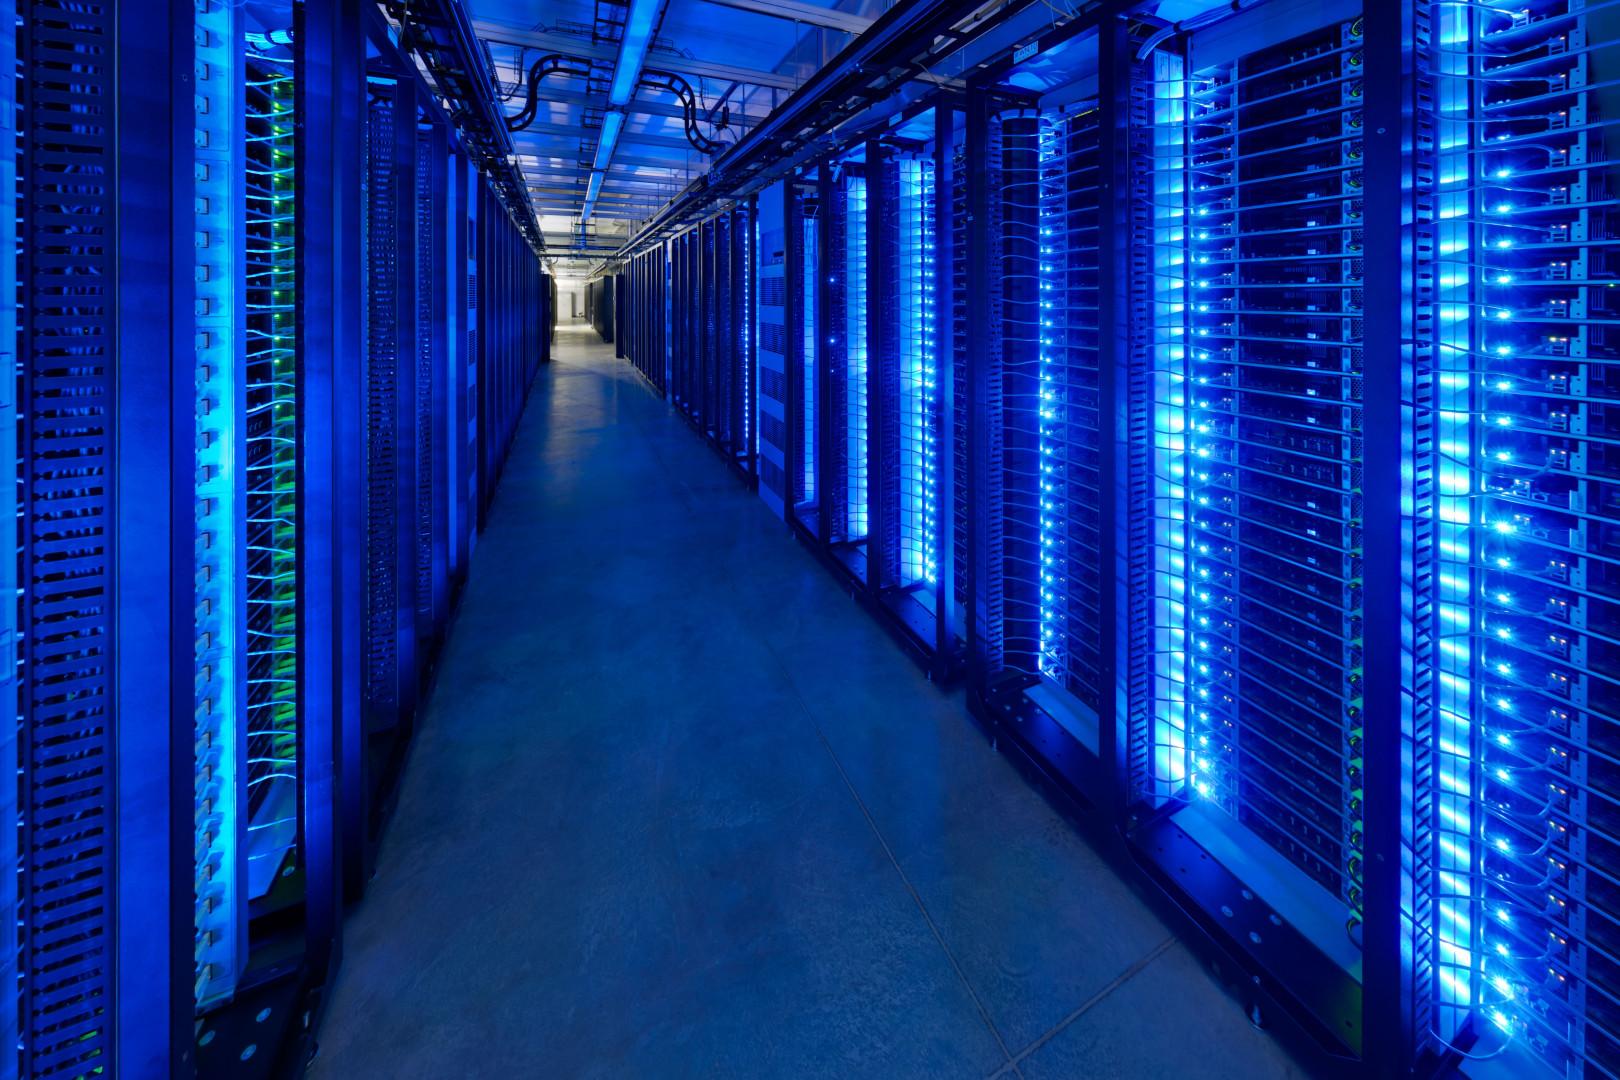 Dark data center room with blue glowing server lights.